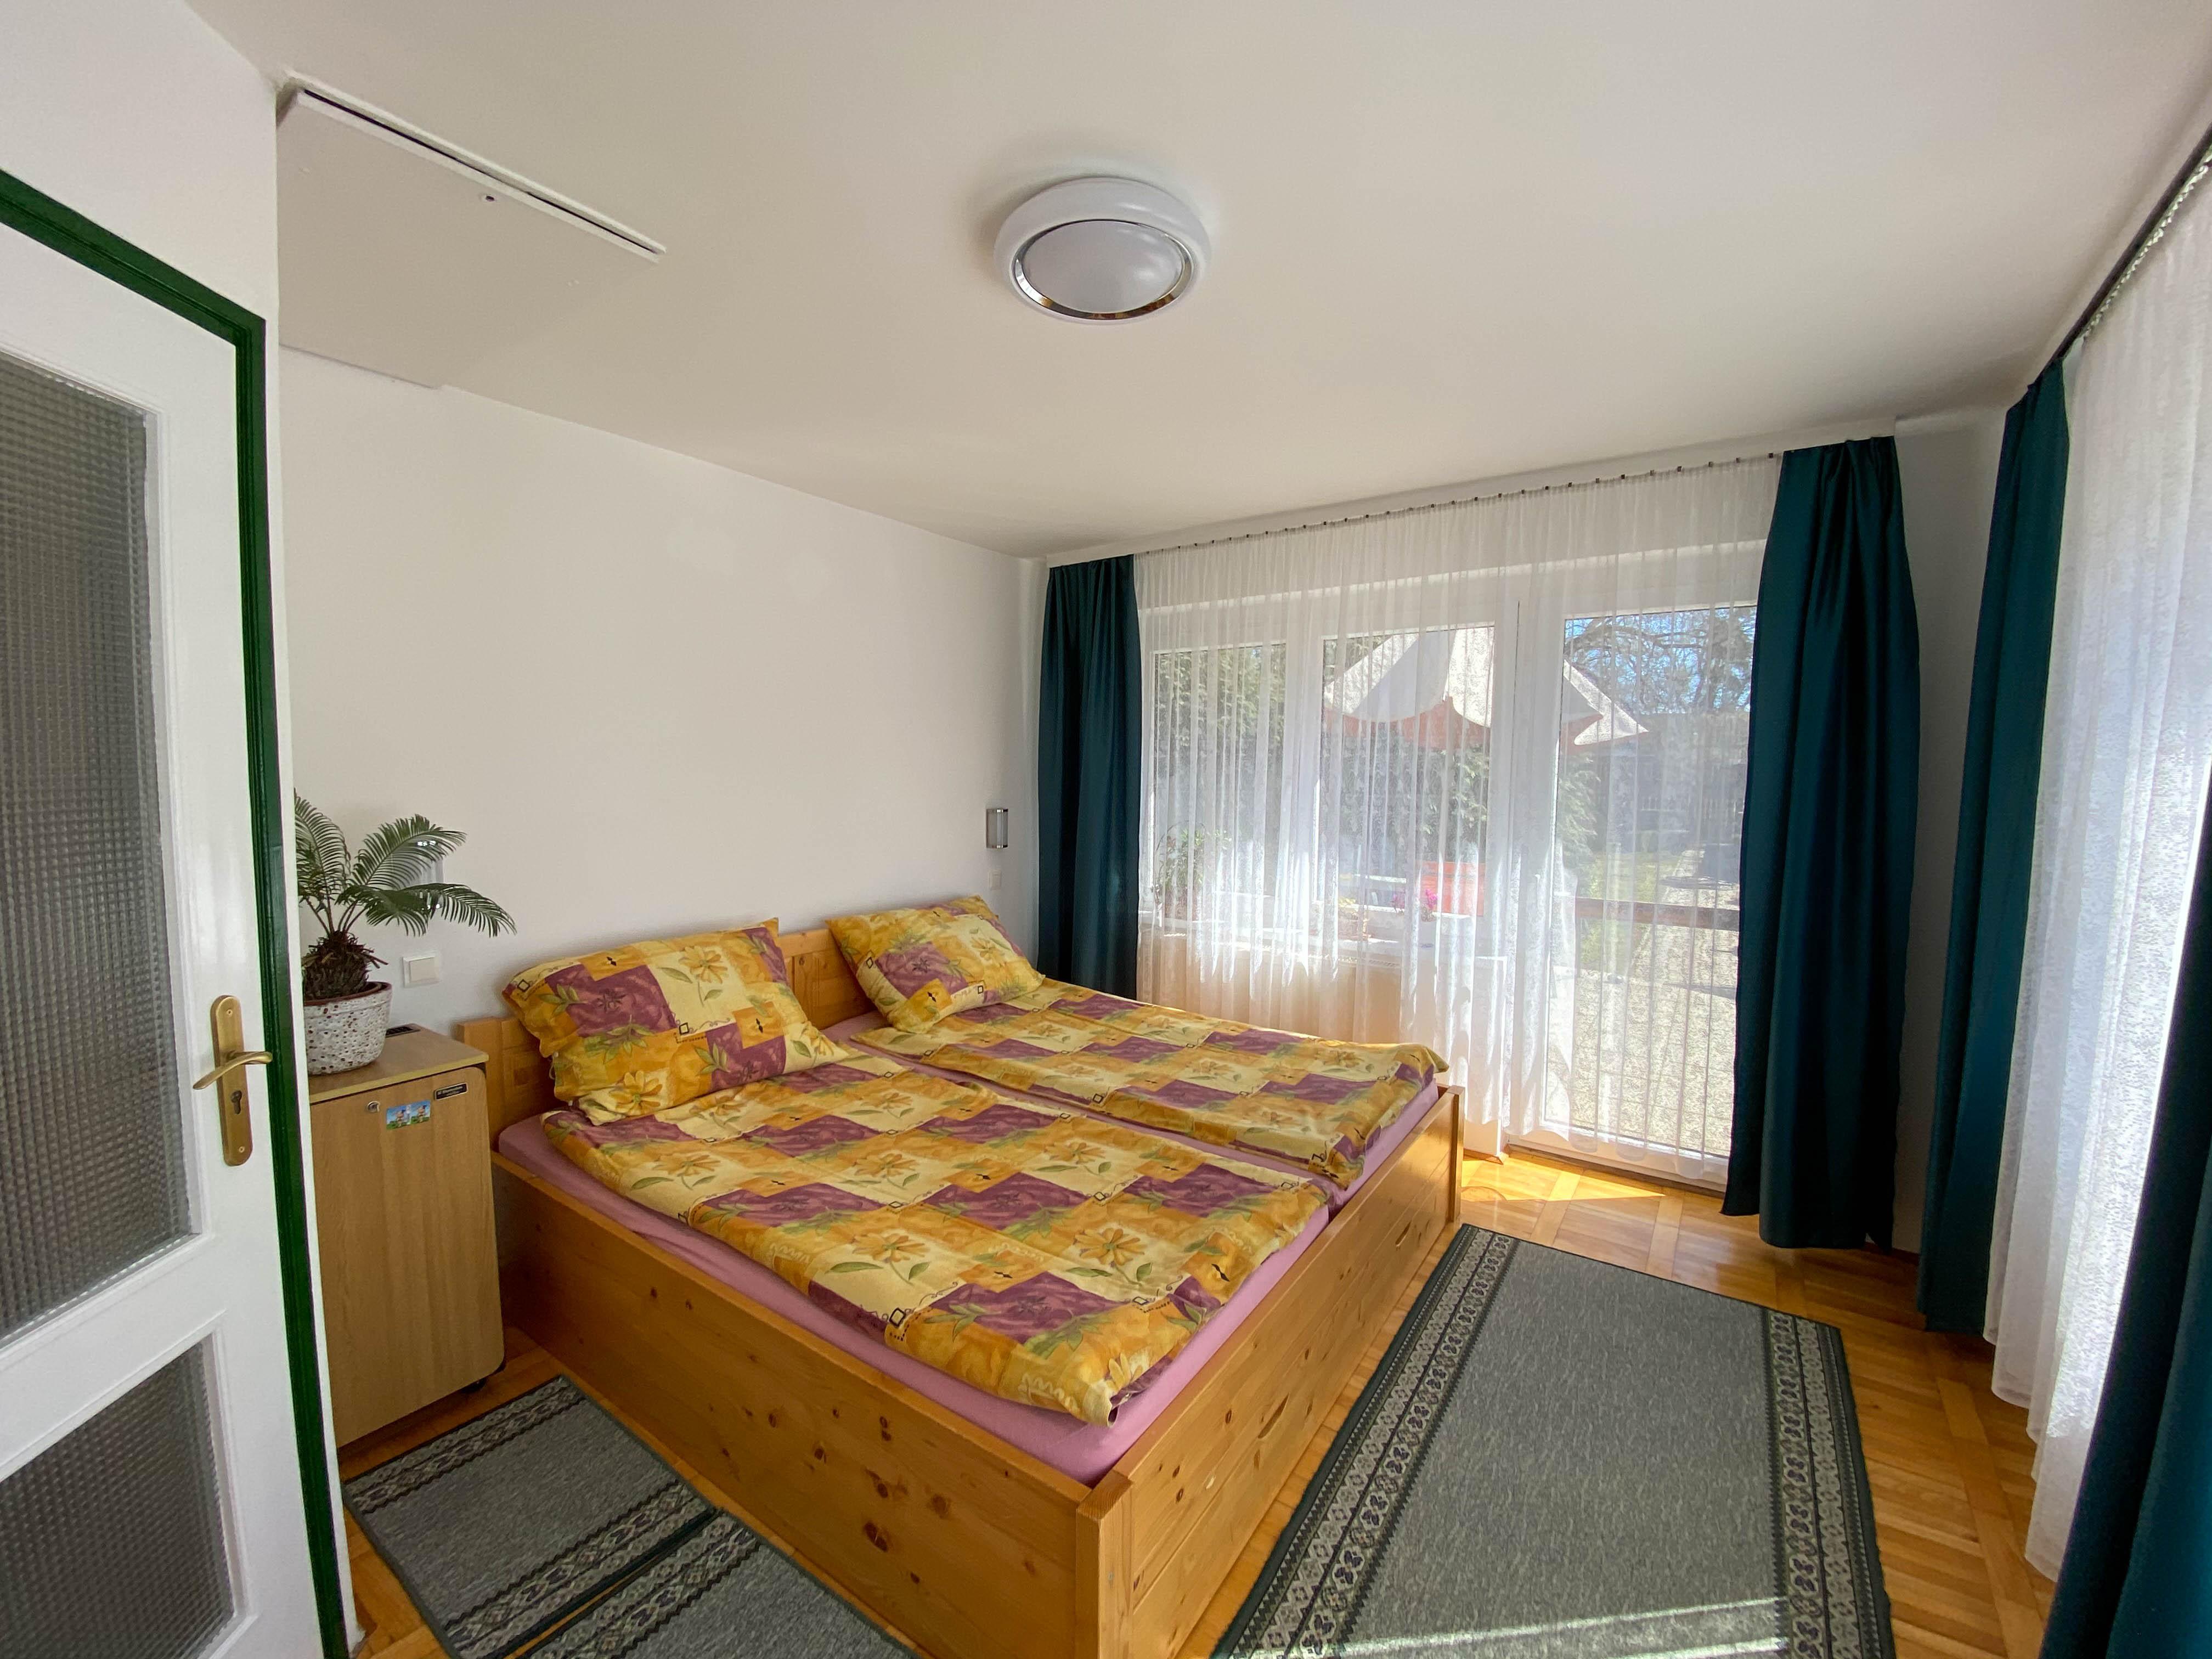 Kirandulastervezo-Sarospatak-Iskolakert-Apartman-9.jpg